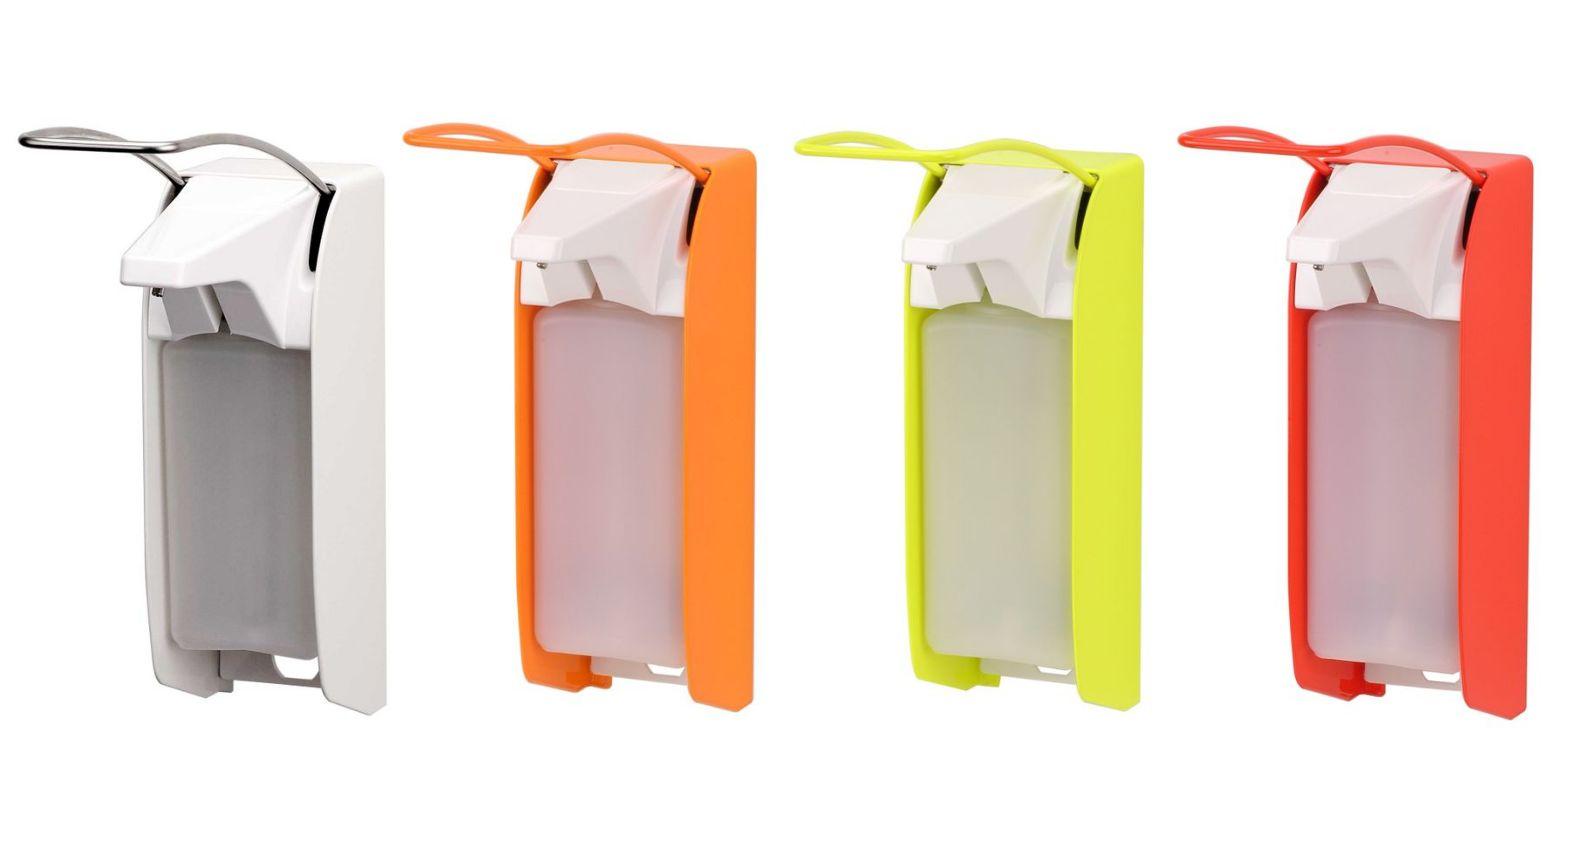 Arm-Lever-Soap-Dispensers